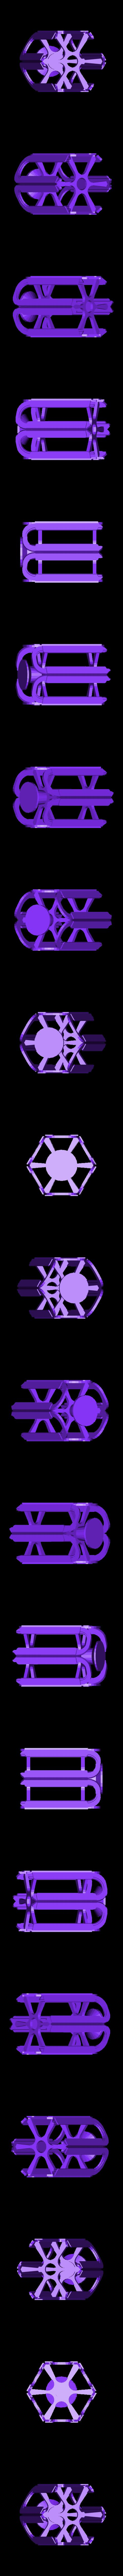 Assembly.stl Download free STL file Dolce Gusto Capsule Holder • 3D printer object, MVSValero